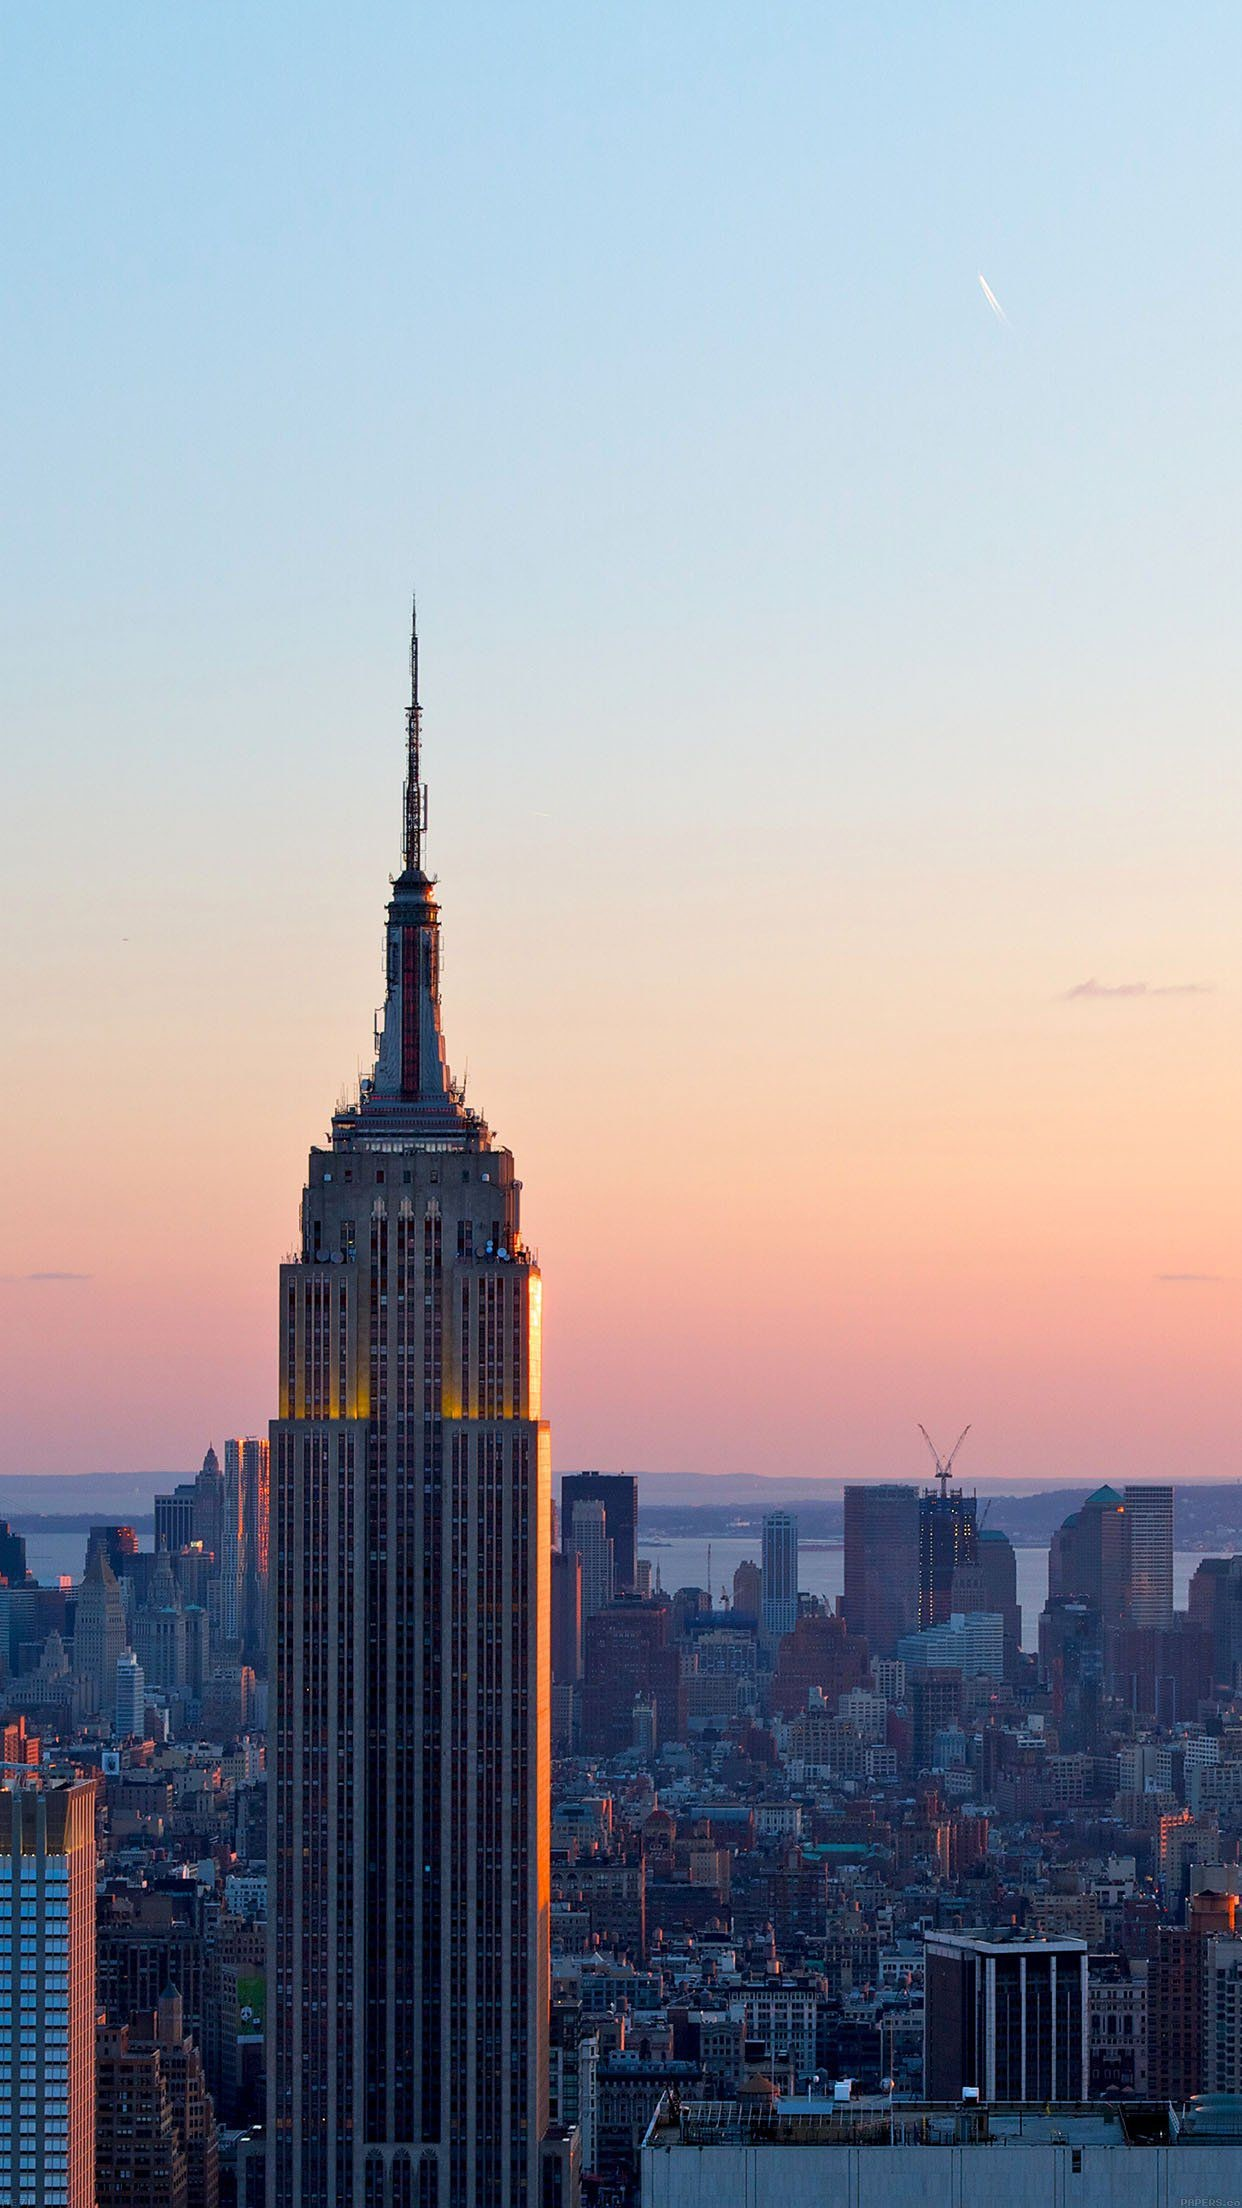 dusk new york skyline city iphone 7 wallpaper